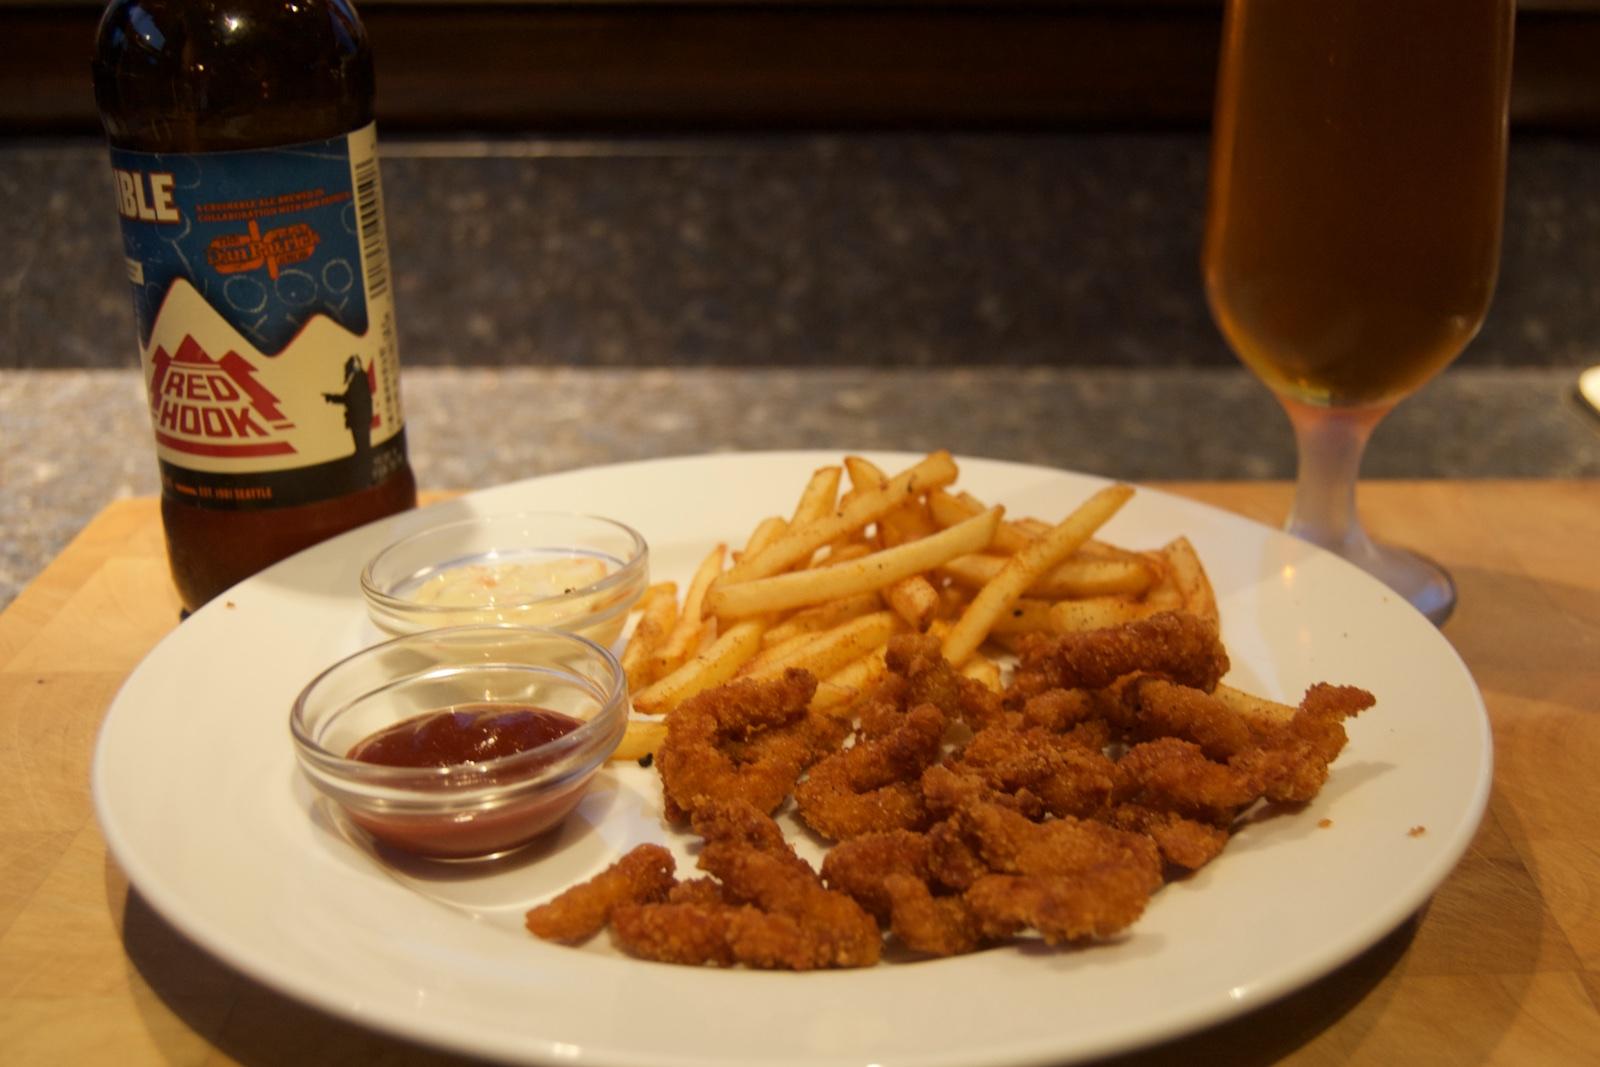 http://blog.rickk.com/food/2015/11/14/ate.2015.11.13.d.jpg